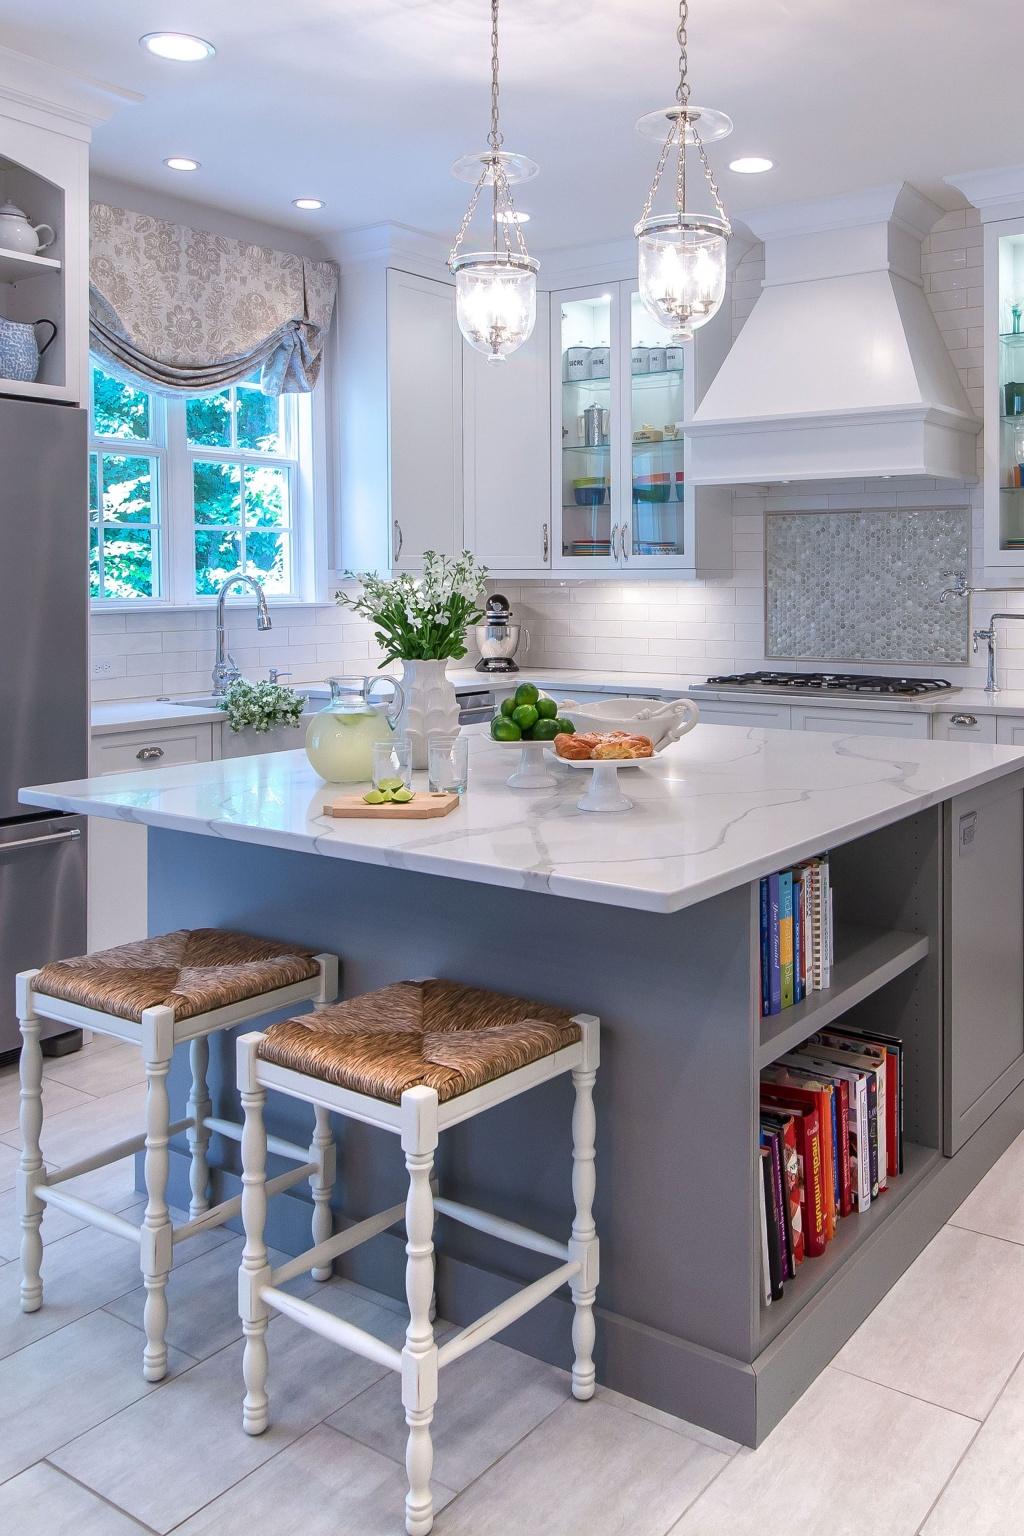 Soft kitchen island with bookcase